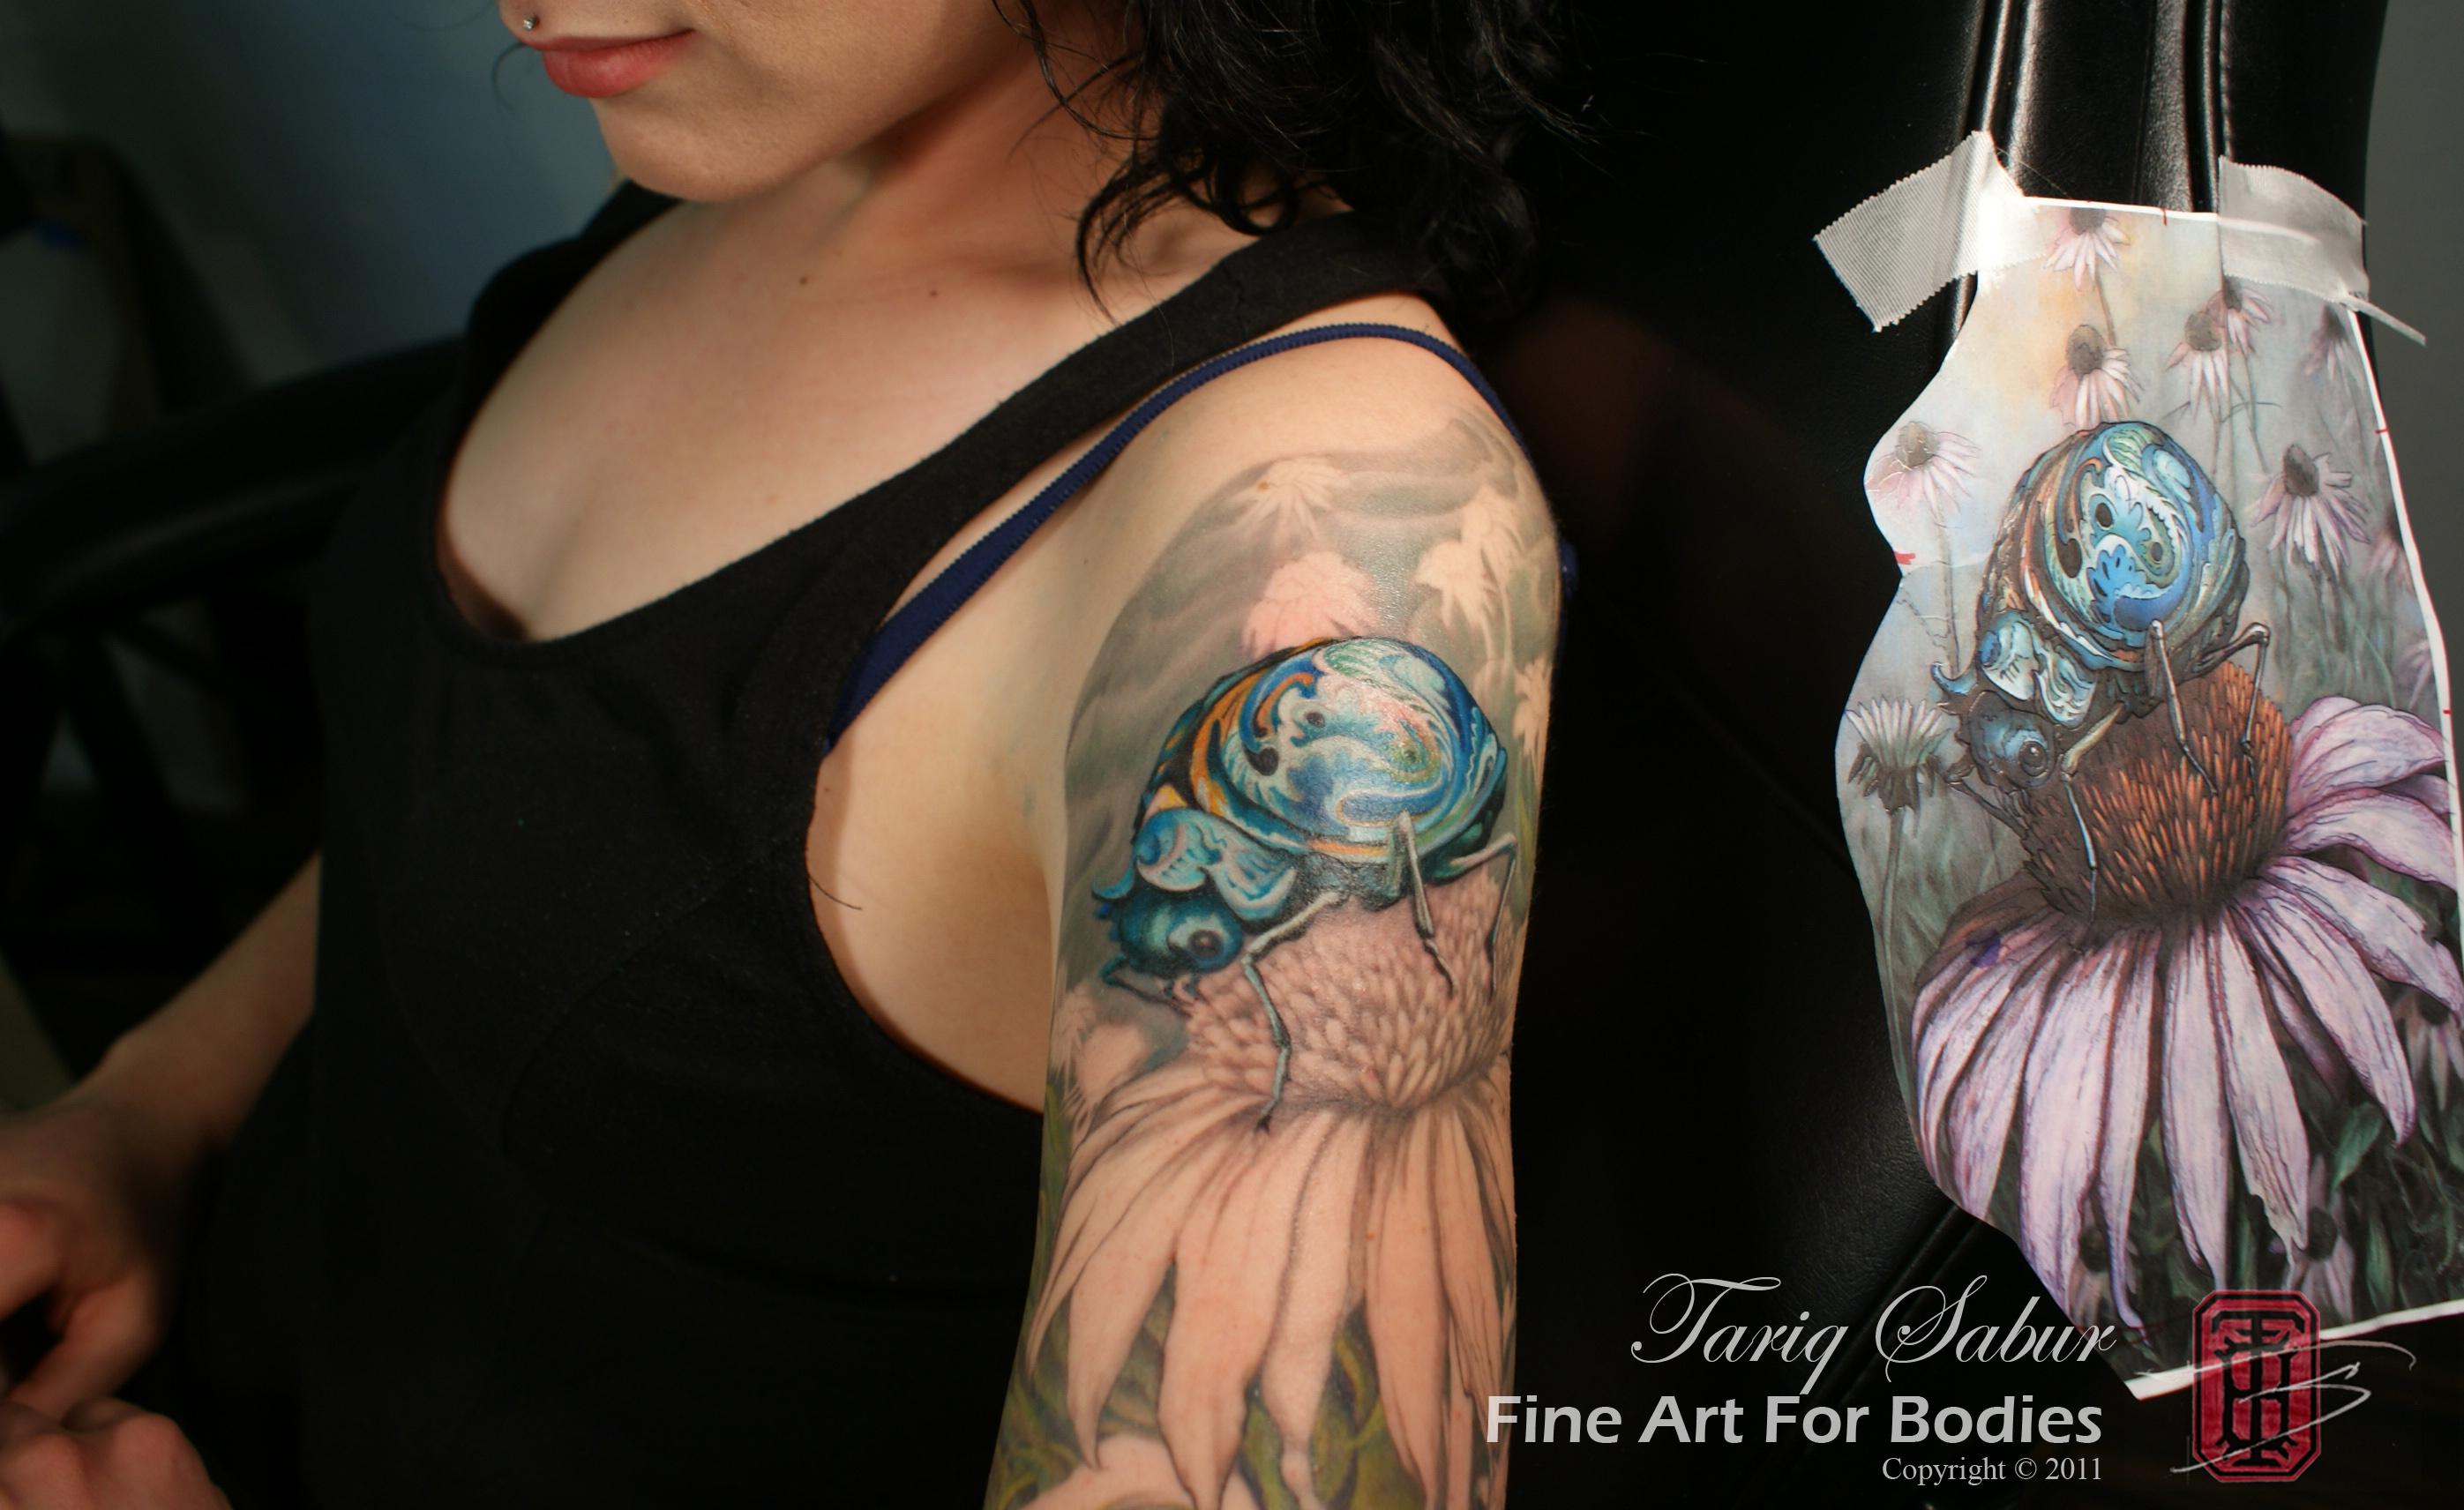 Gentleman Bug Fine Art For Bodies Premium Custom Body Art